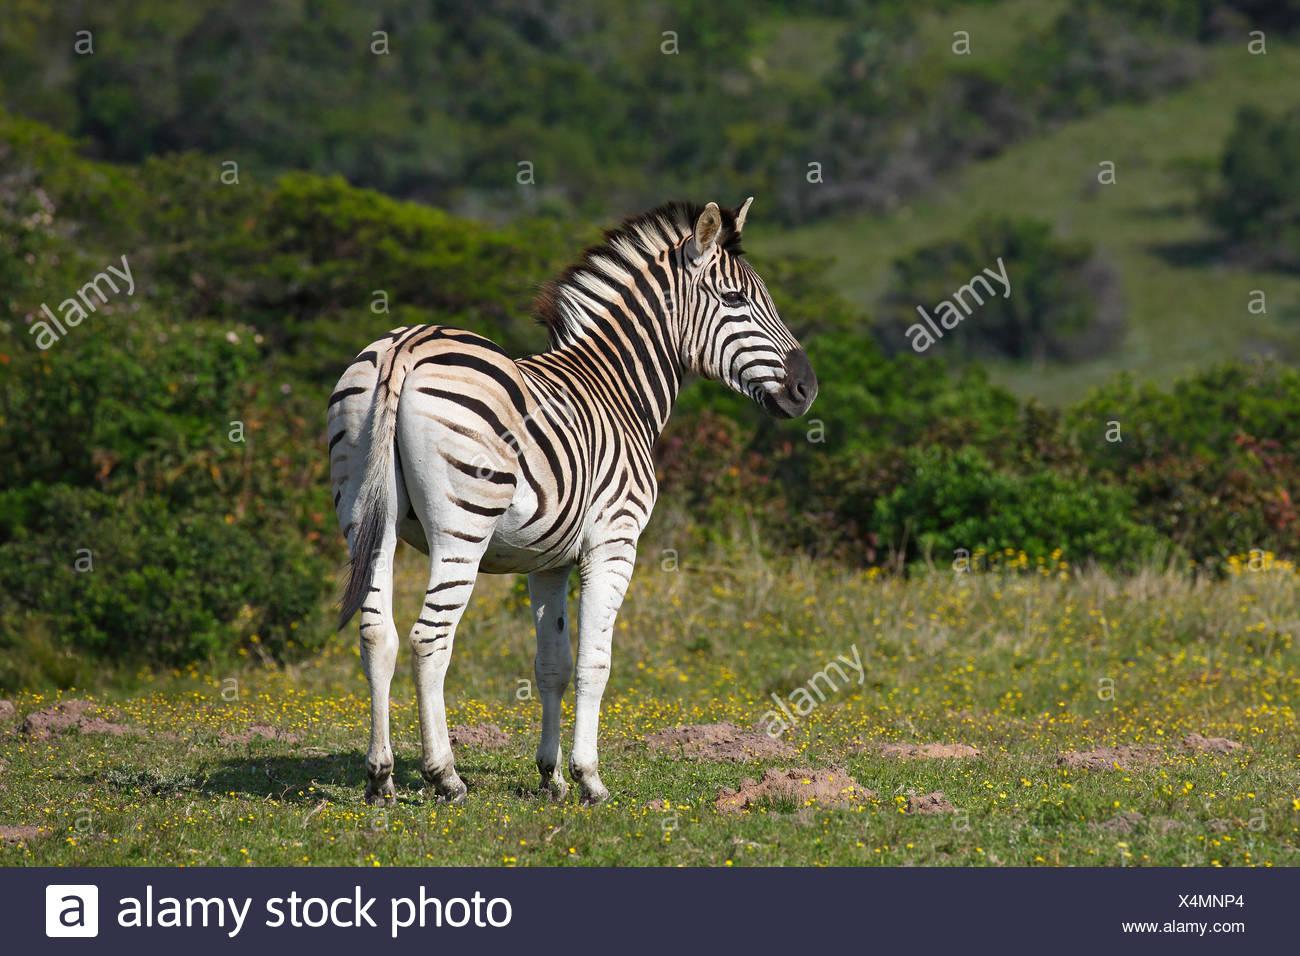 Zebra (Equus quagga burchelli) Burchell's Zebra, Addo Elephant National Park, Sud Africa Immagini Stock